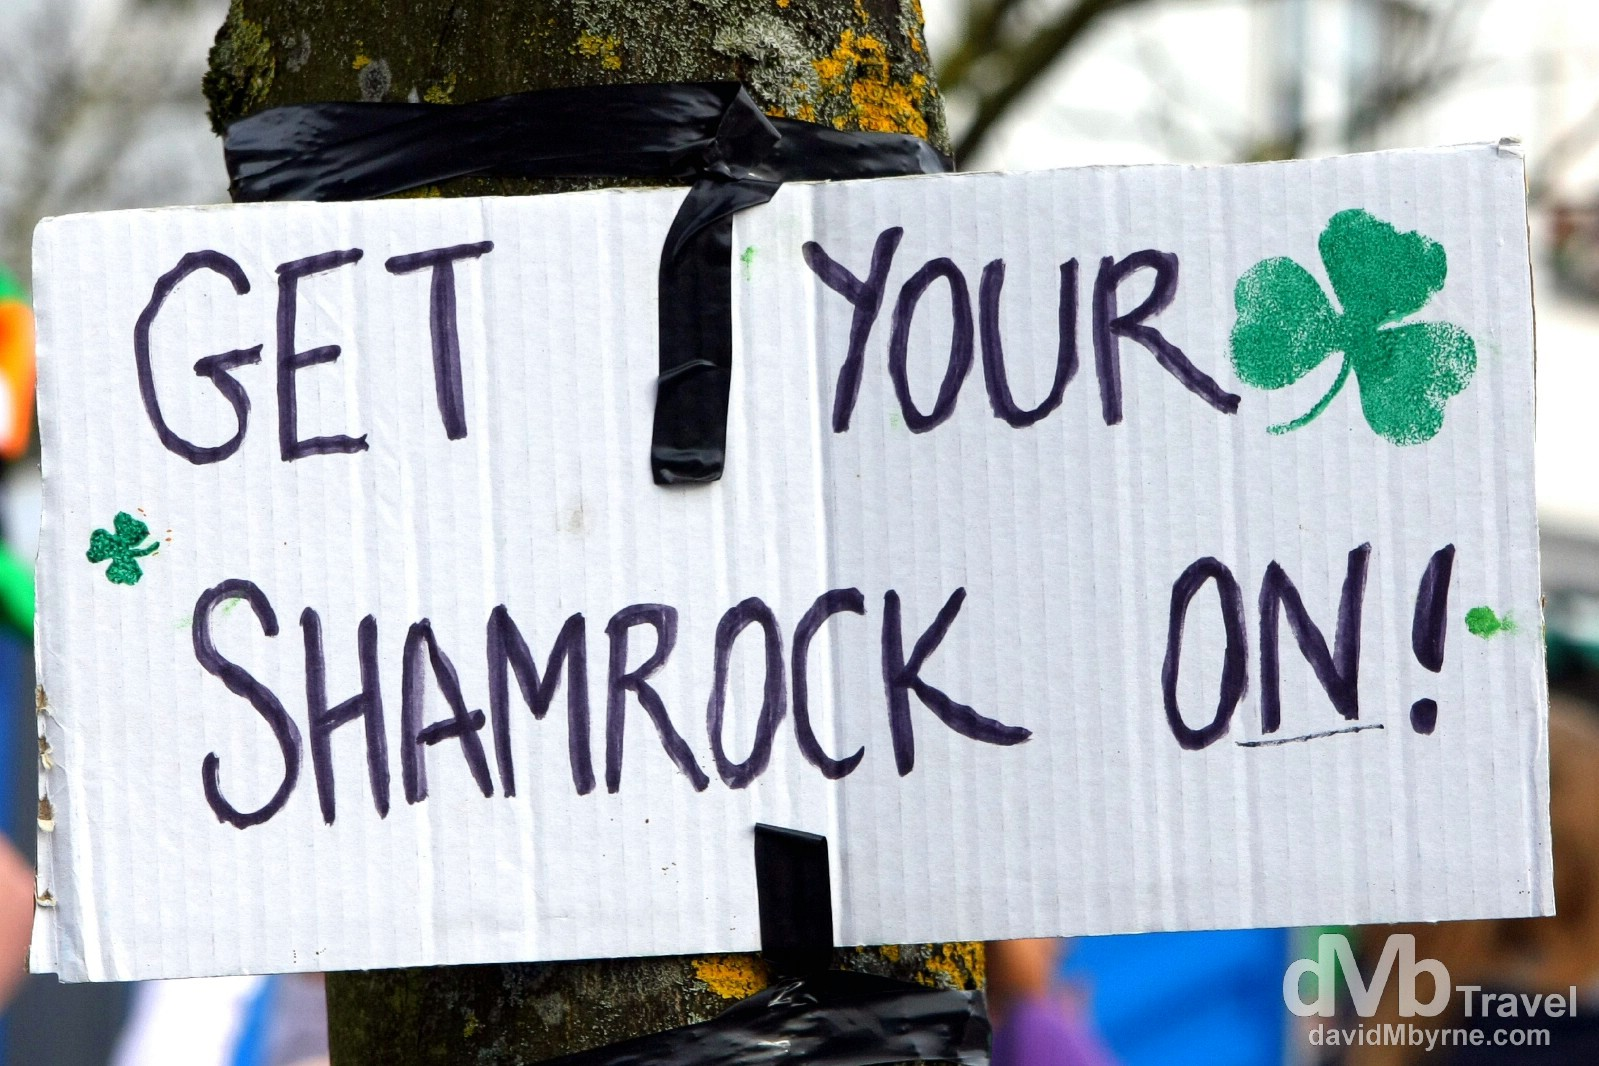 Get Your Shamrock On! Ireland Road Trip 2014.